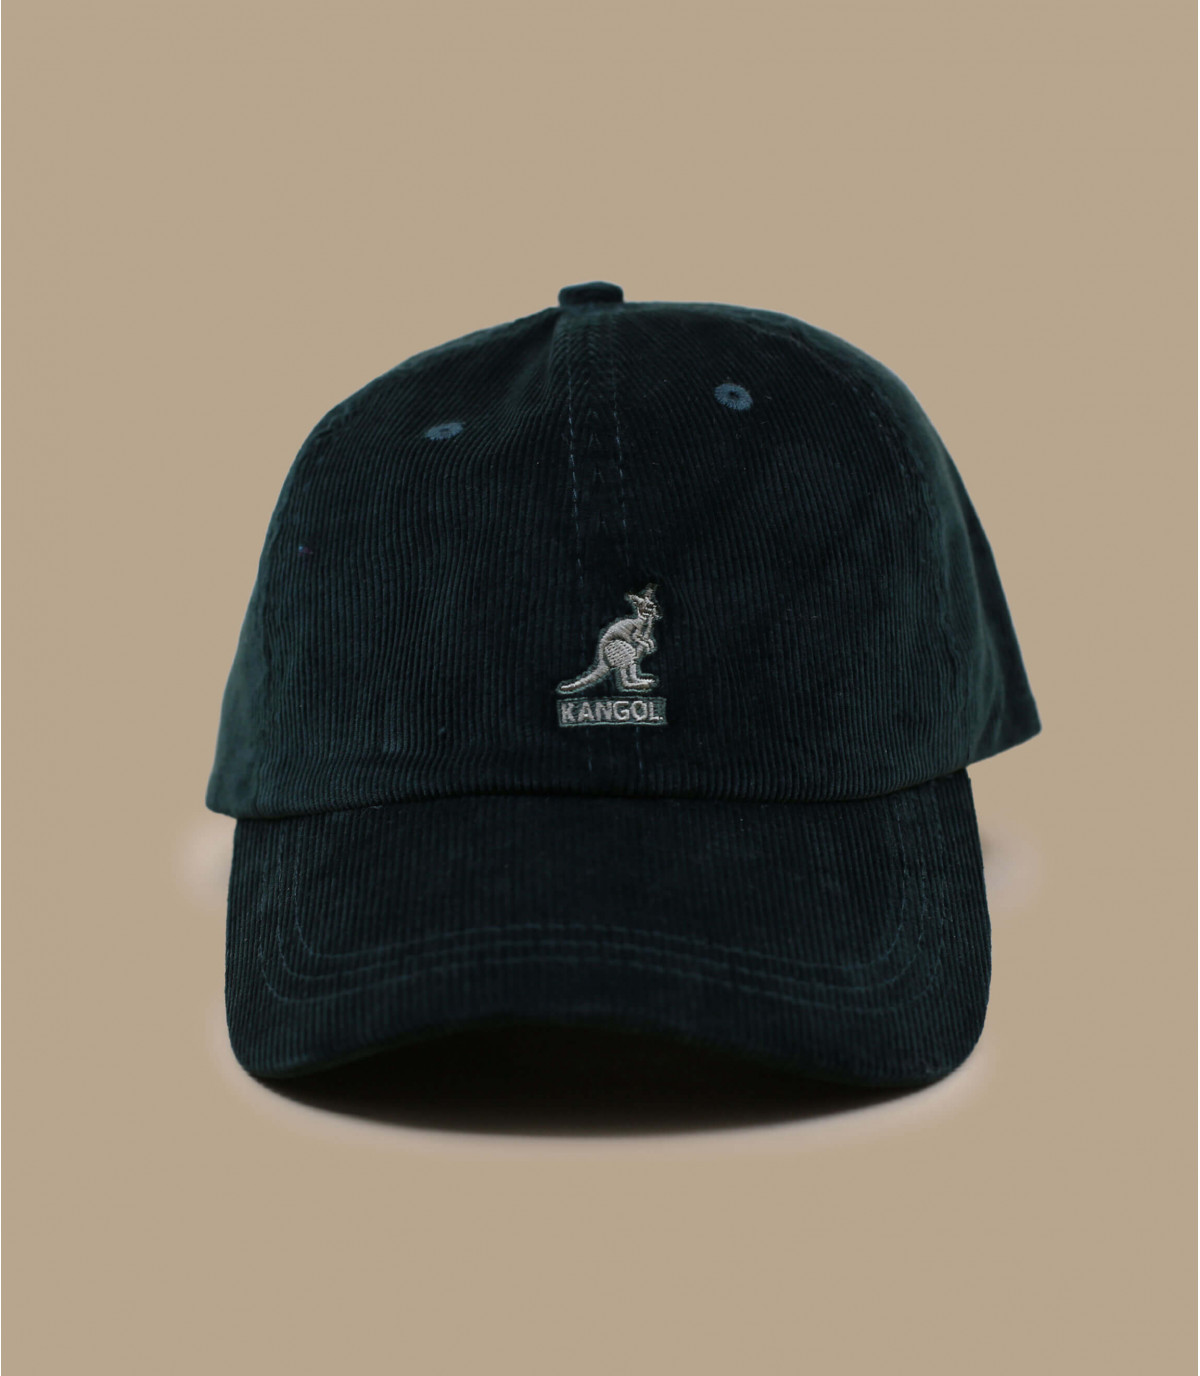 Kangol green army cap